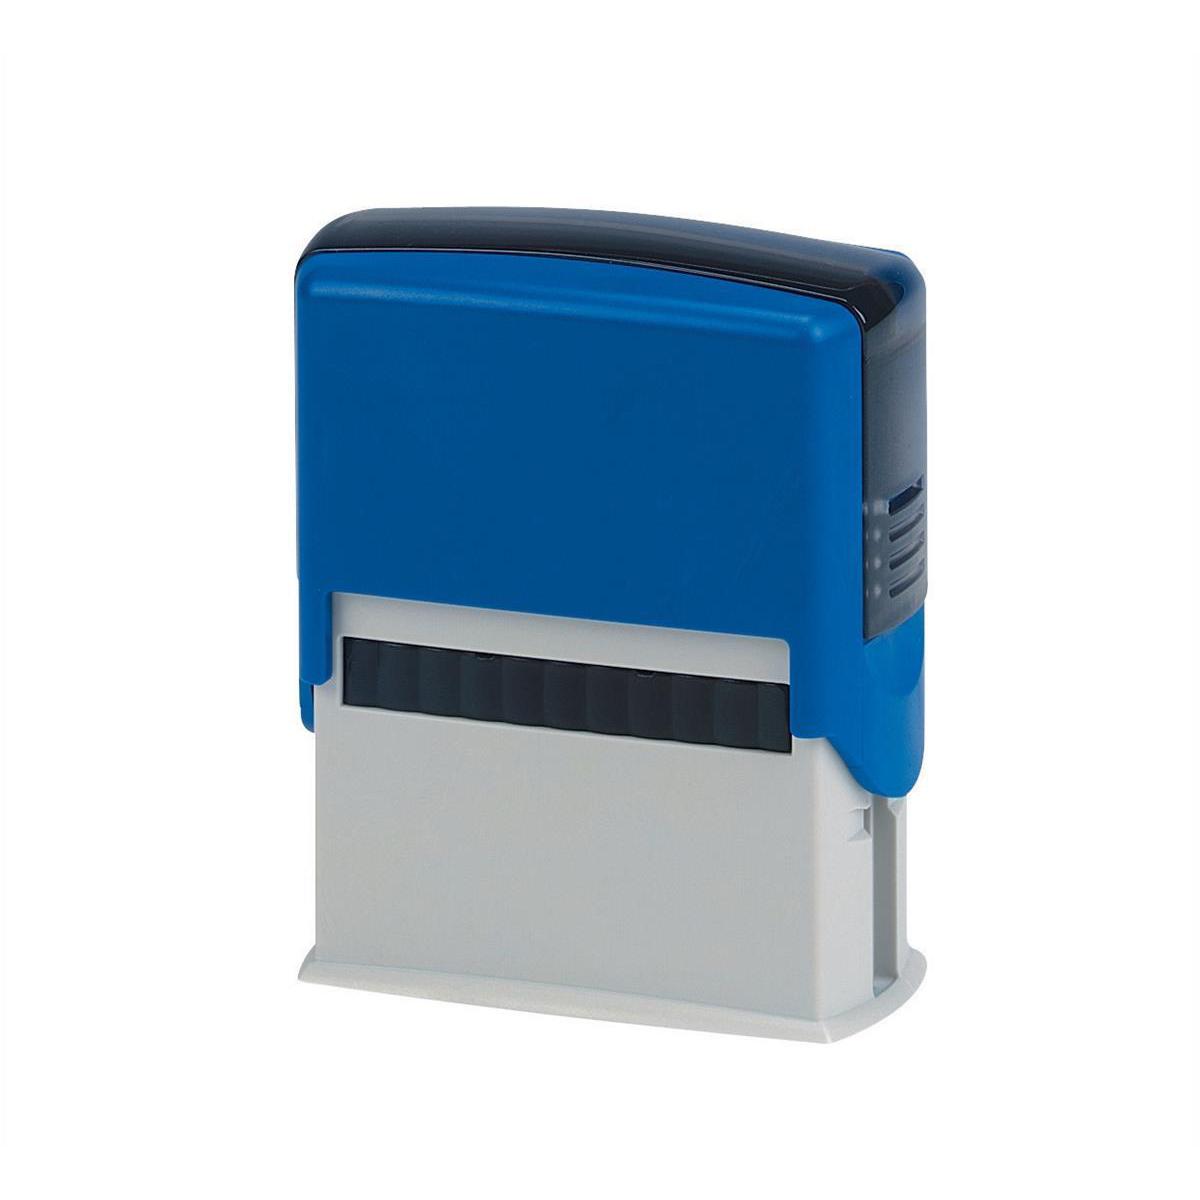 5 Star Self-Inking Imprinter 59x24mm 6 lines